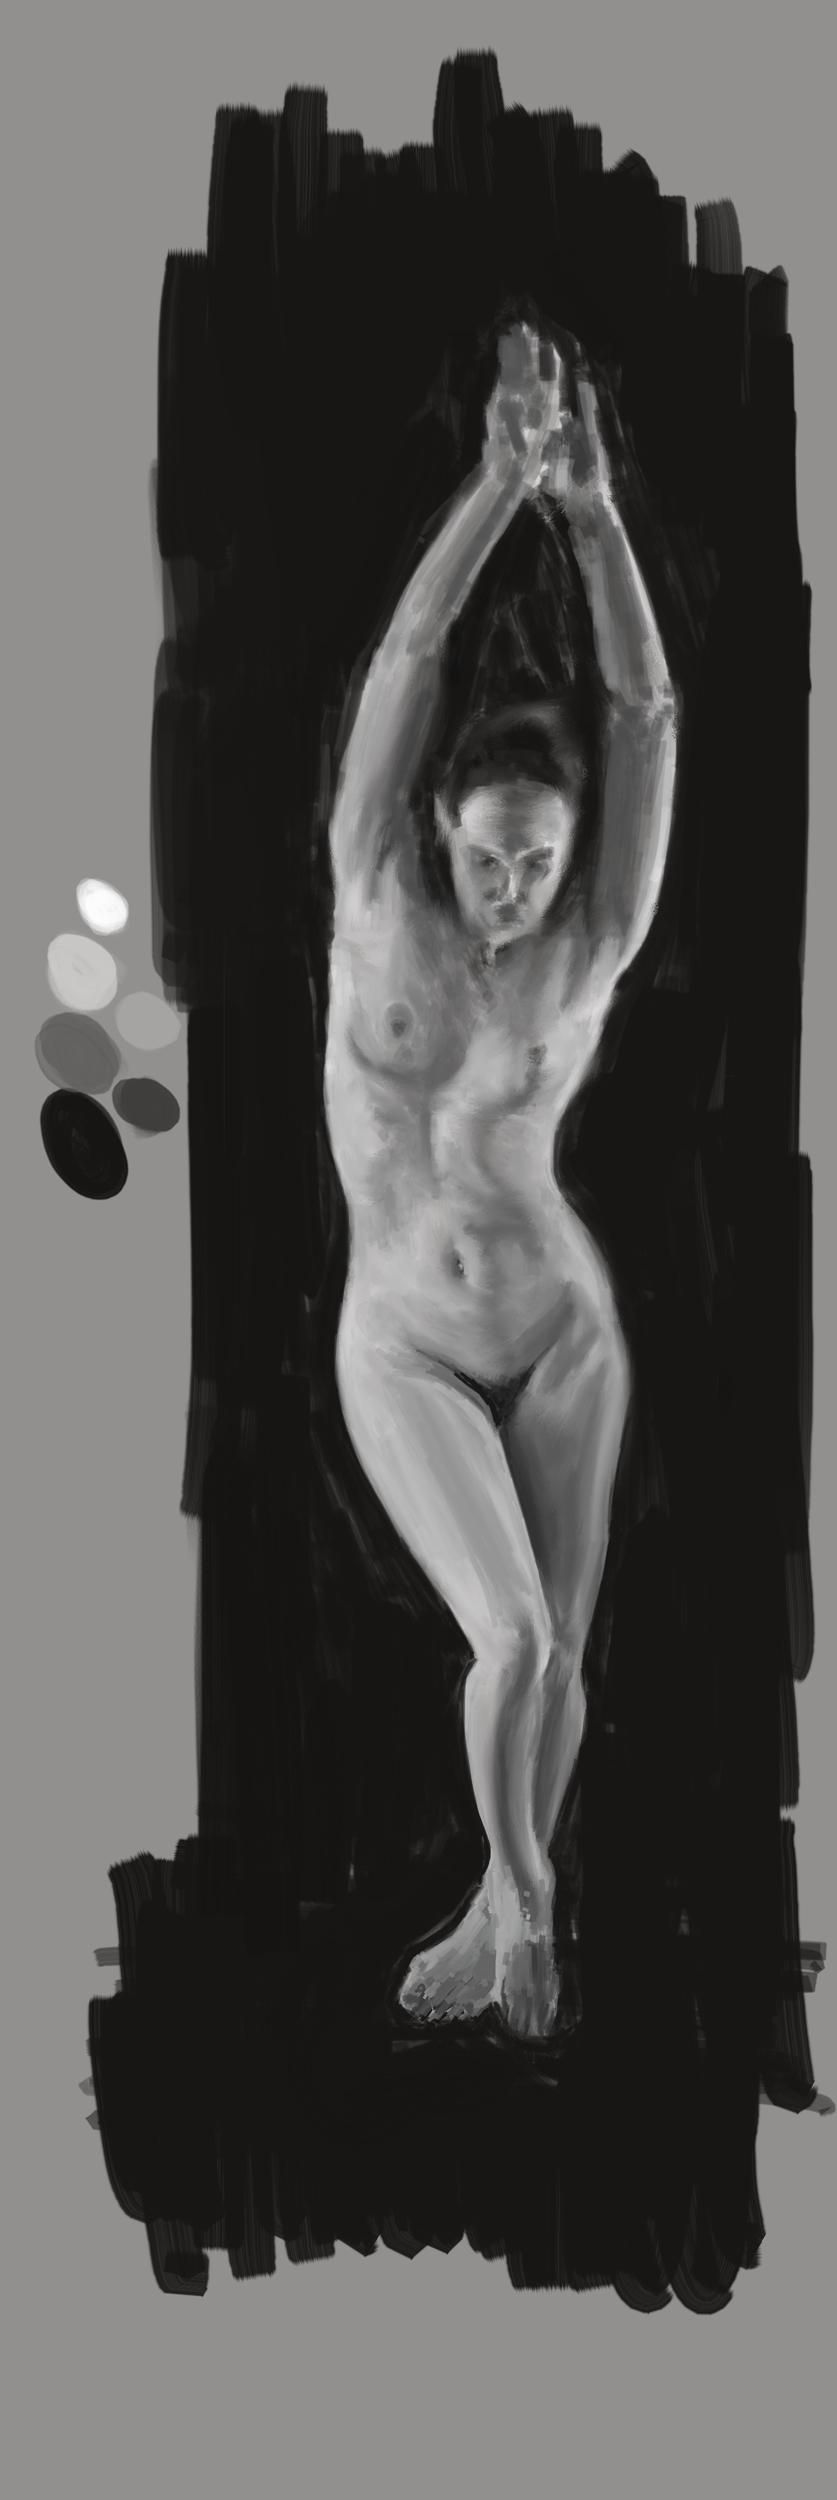 Art-F-Women1-web.jpg